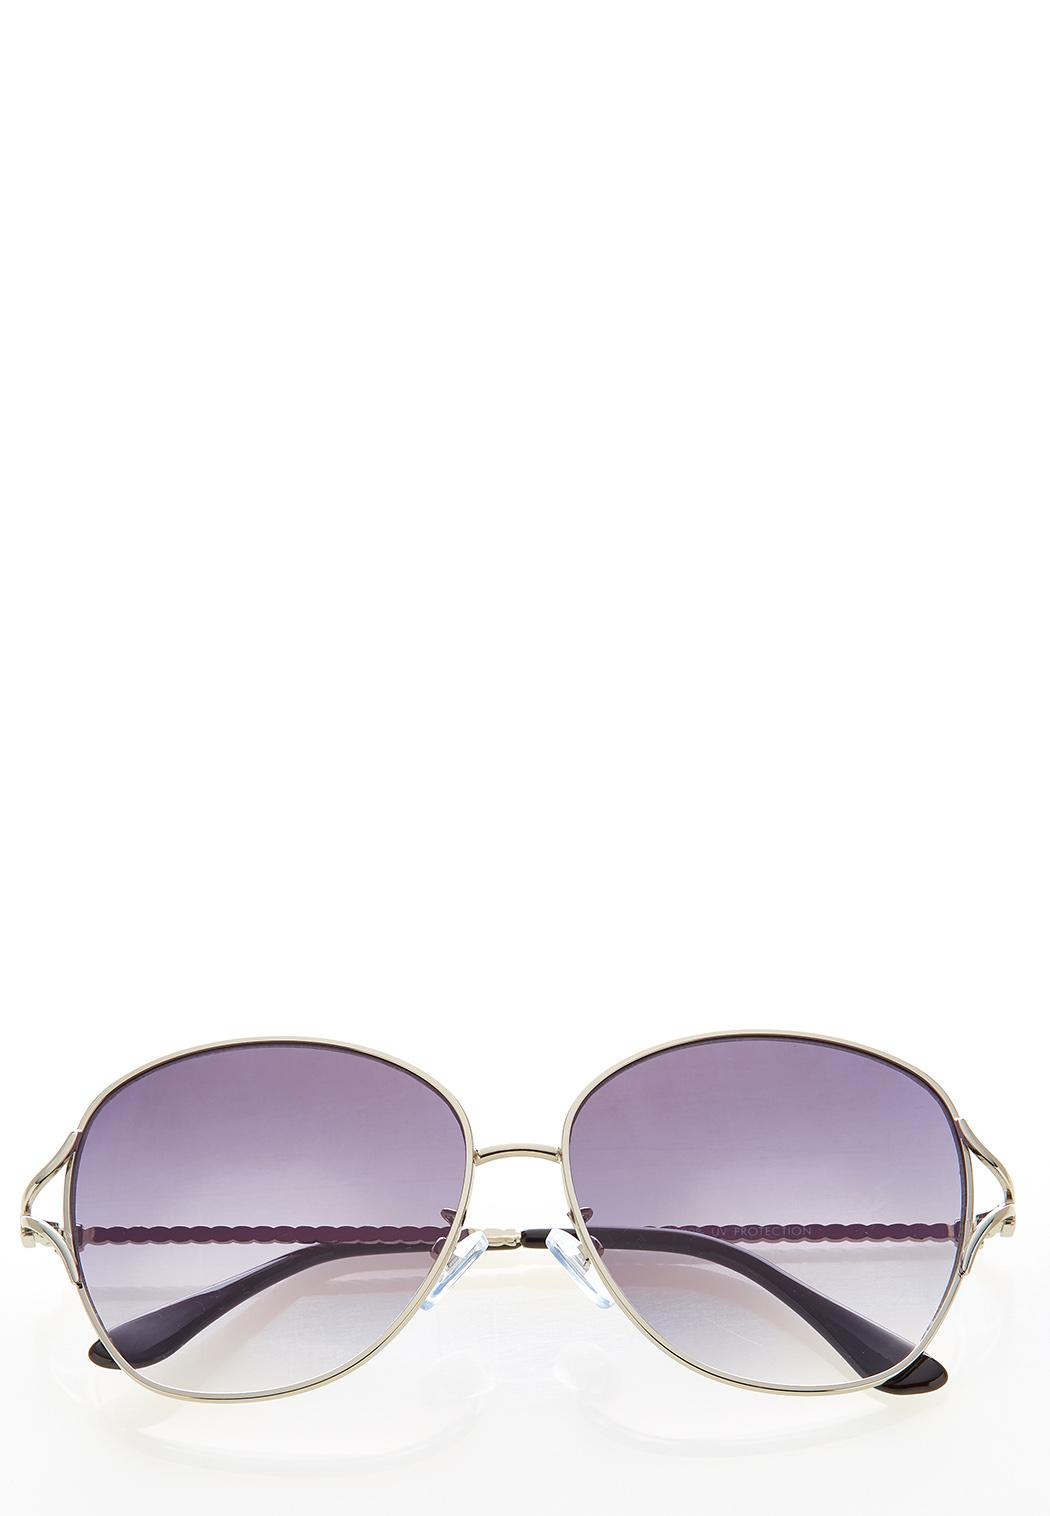 Roped Metal Sunglasses